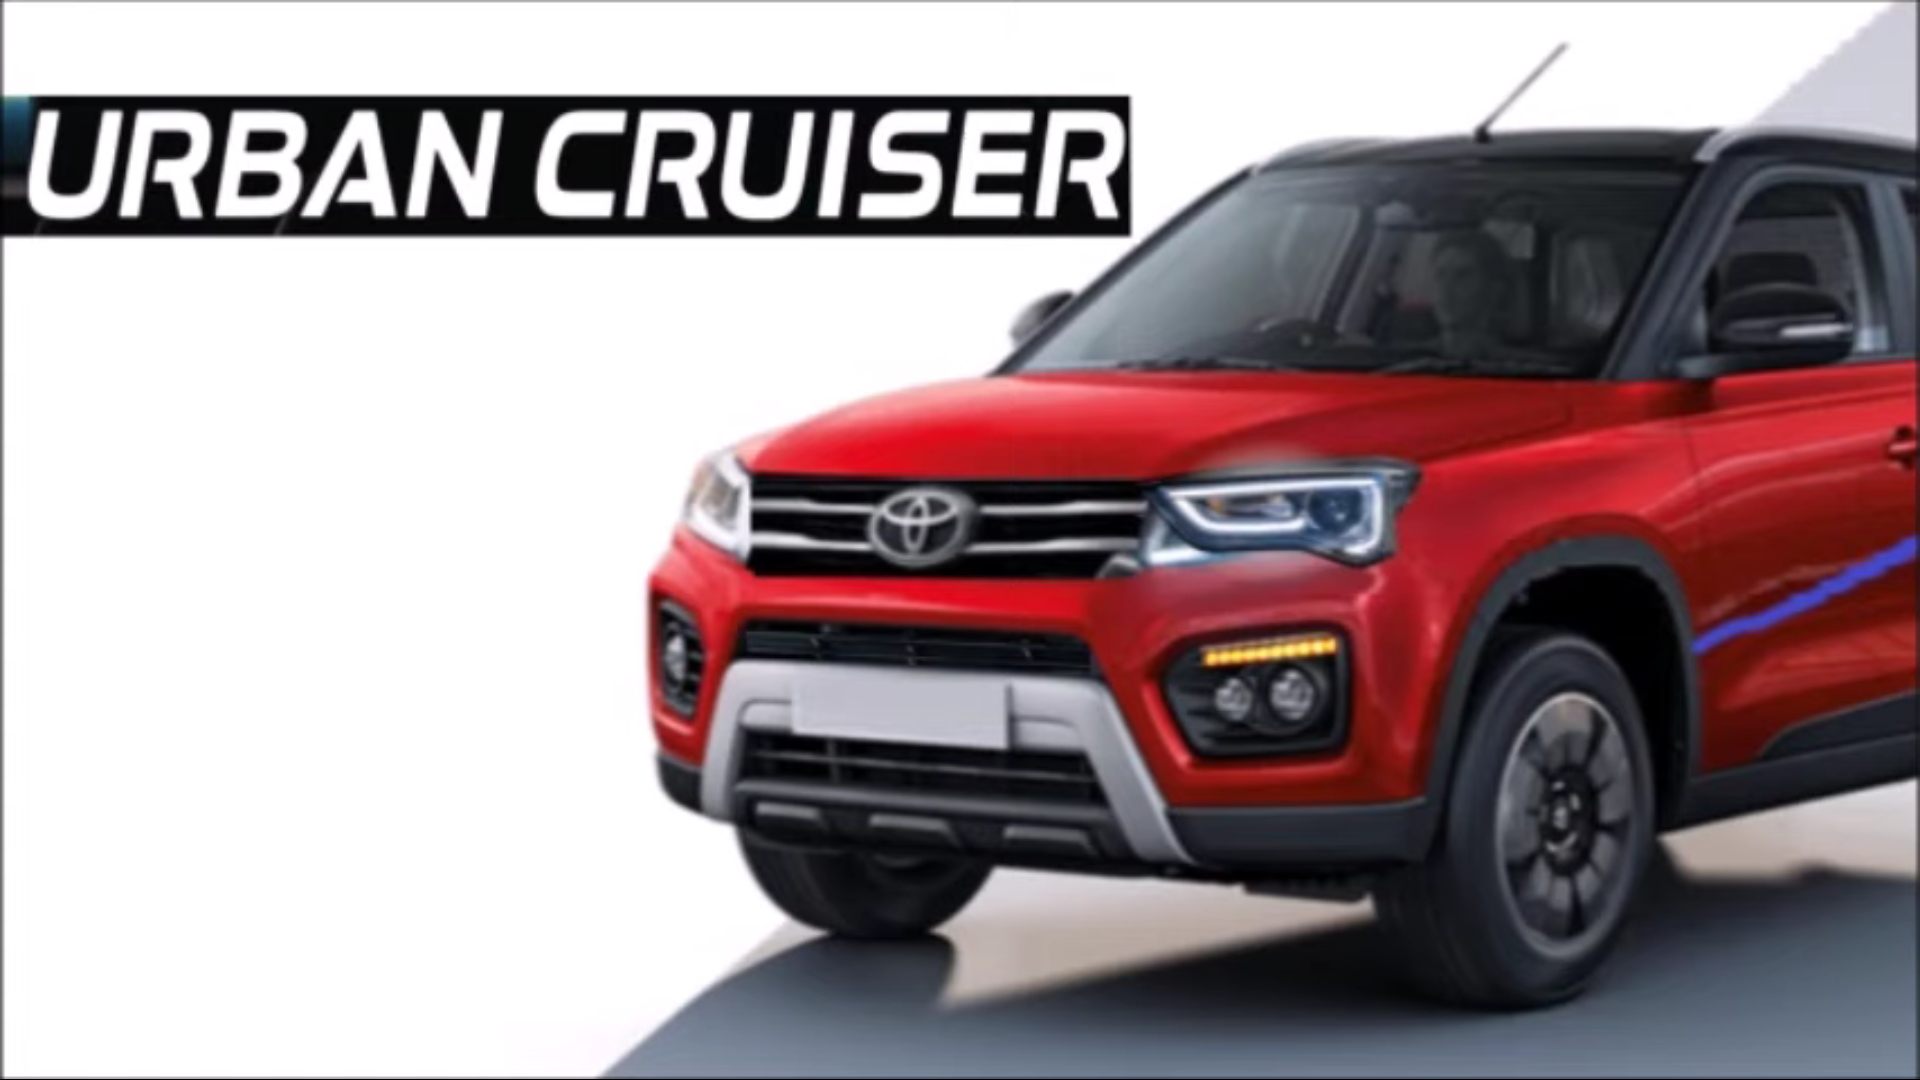 Toyota Urban Cruiser Suv Price In India